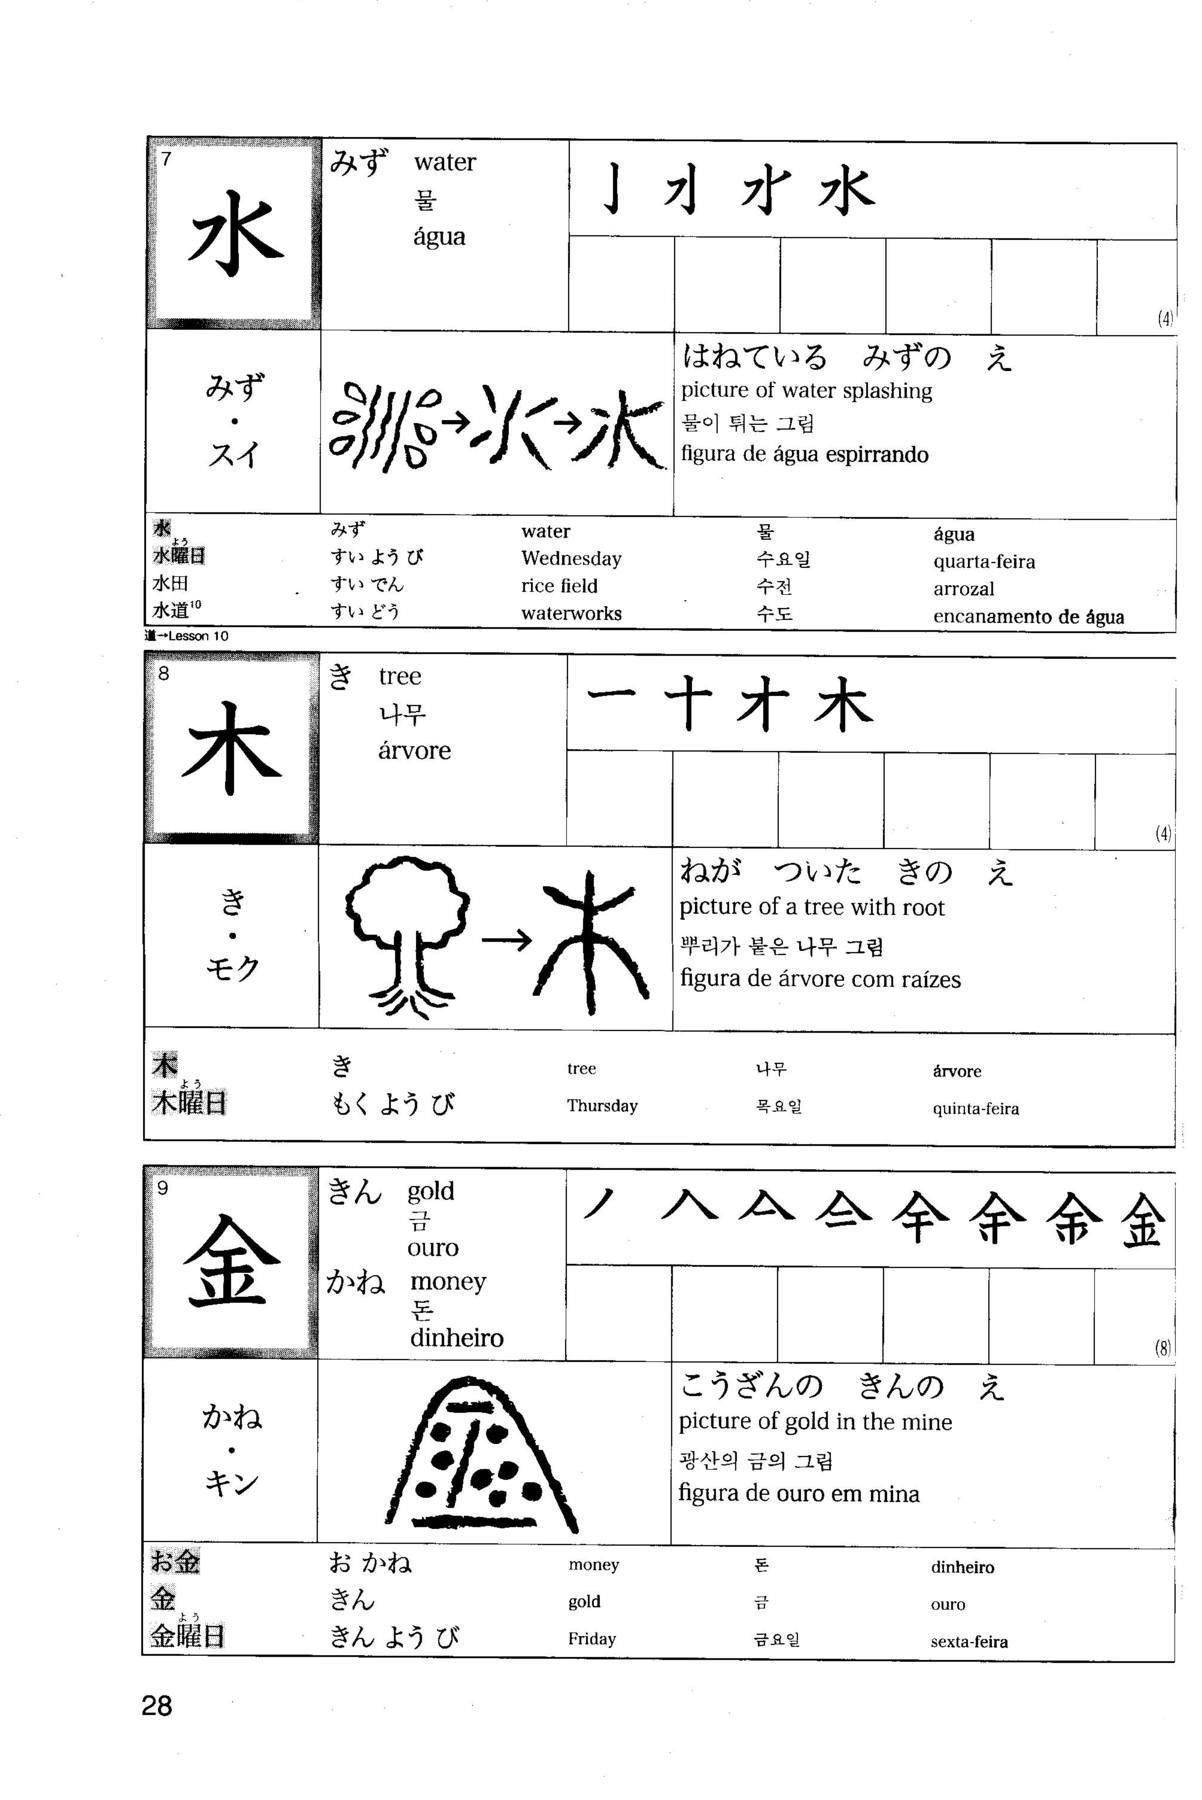 Nihongo Challenge for JLPT N4 & N5 Kanji | Study | Japanese